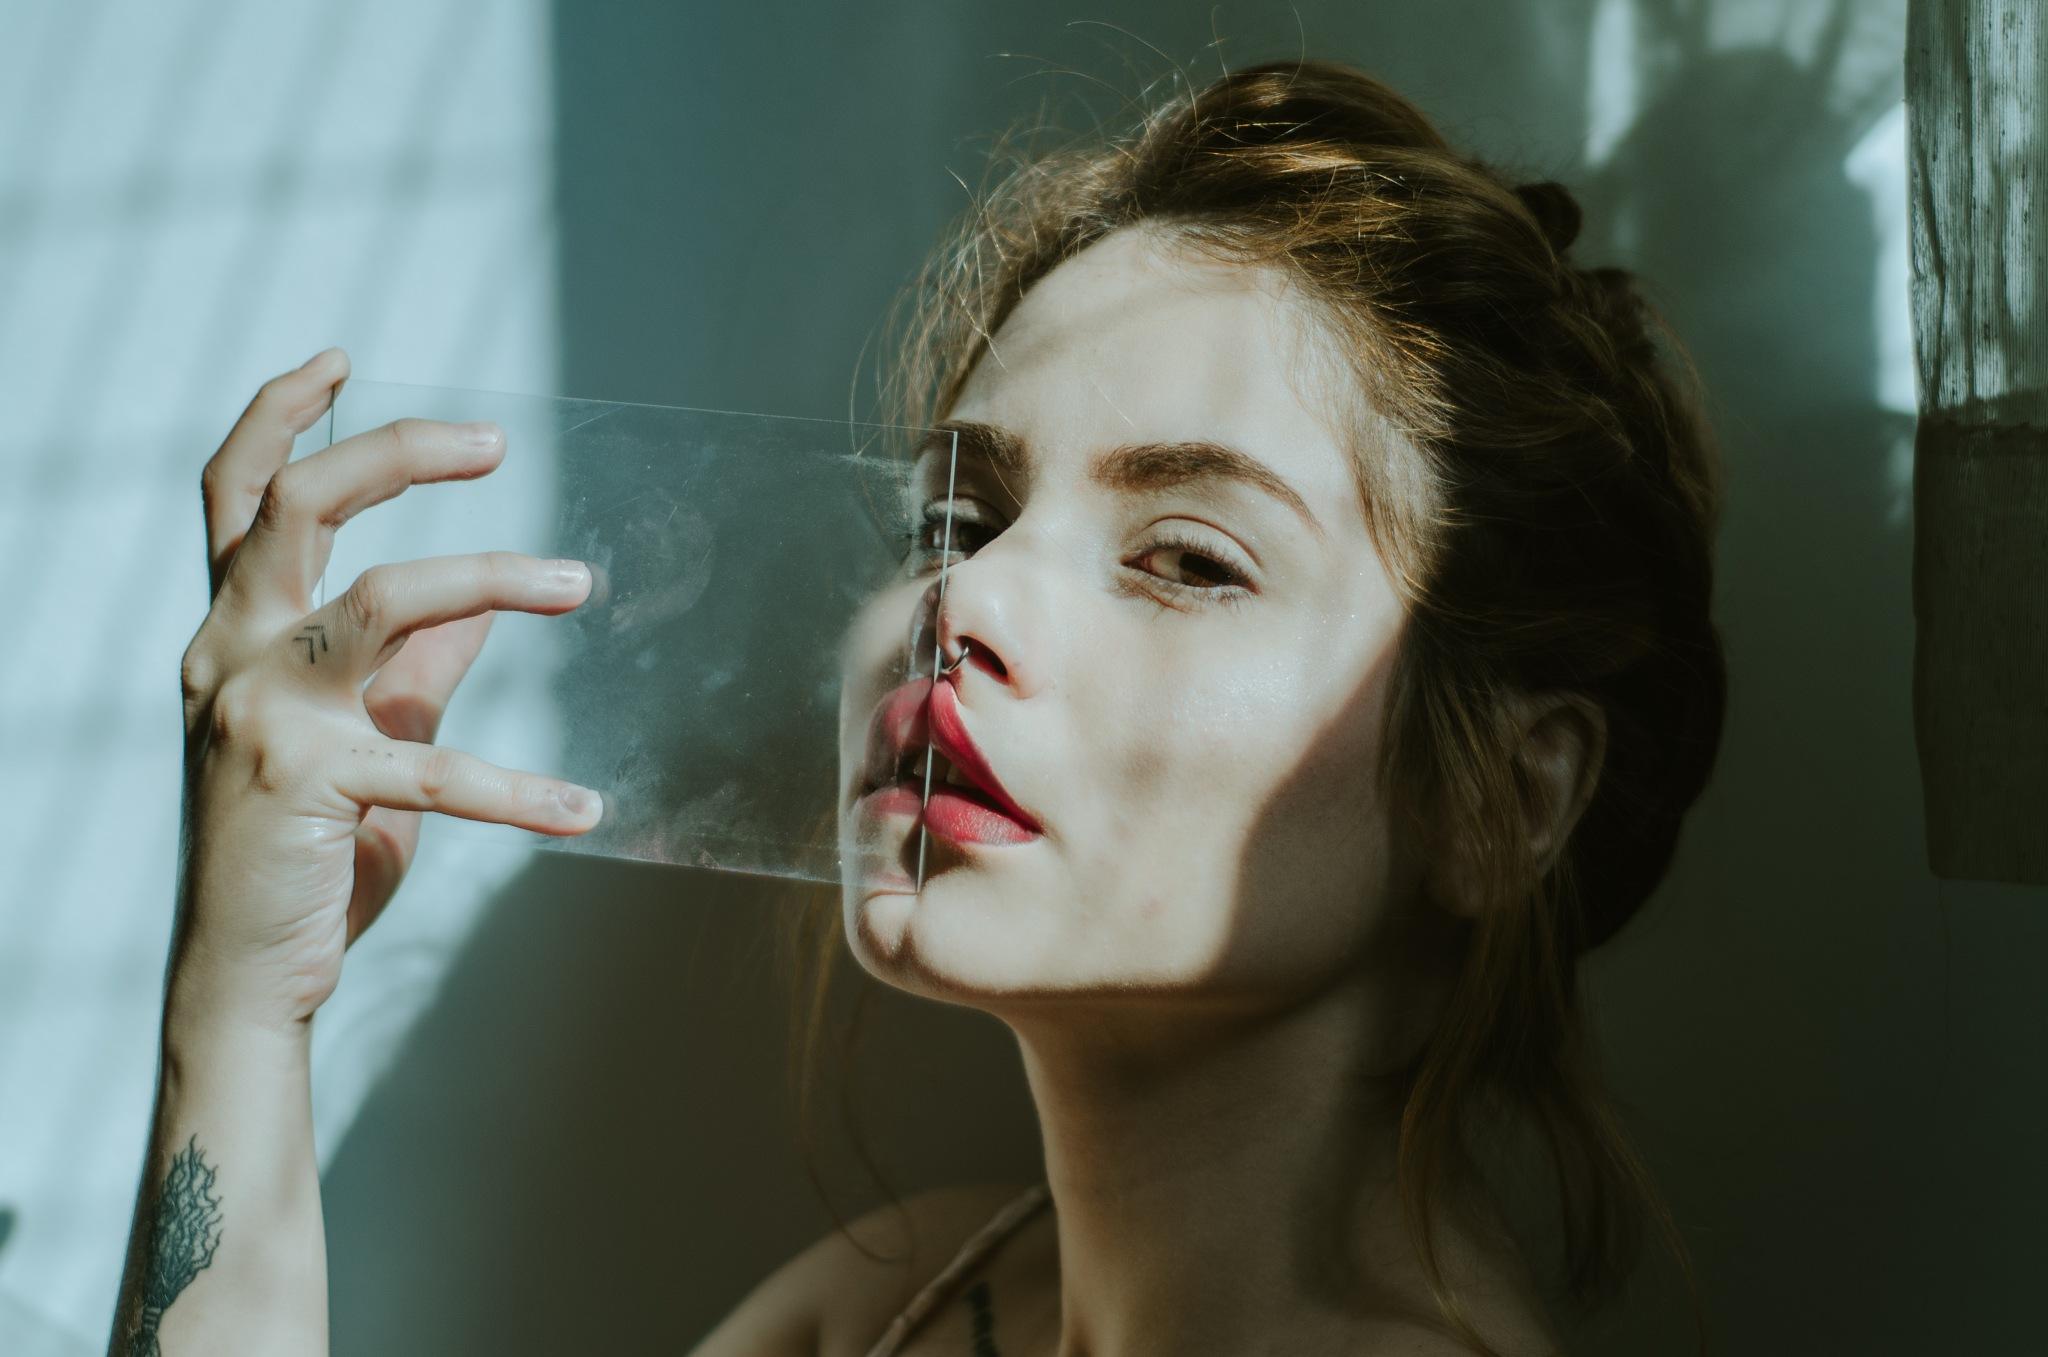 made of glass by Pâmela Pauany